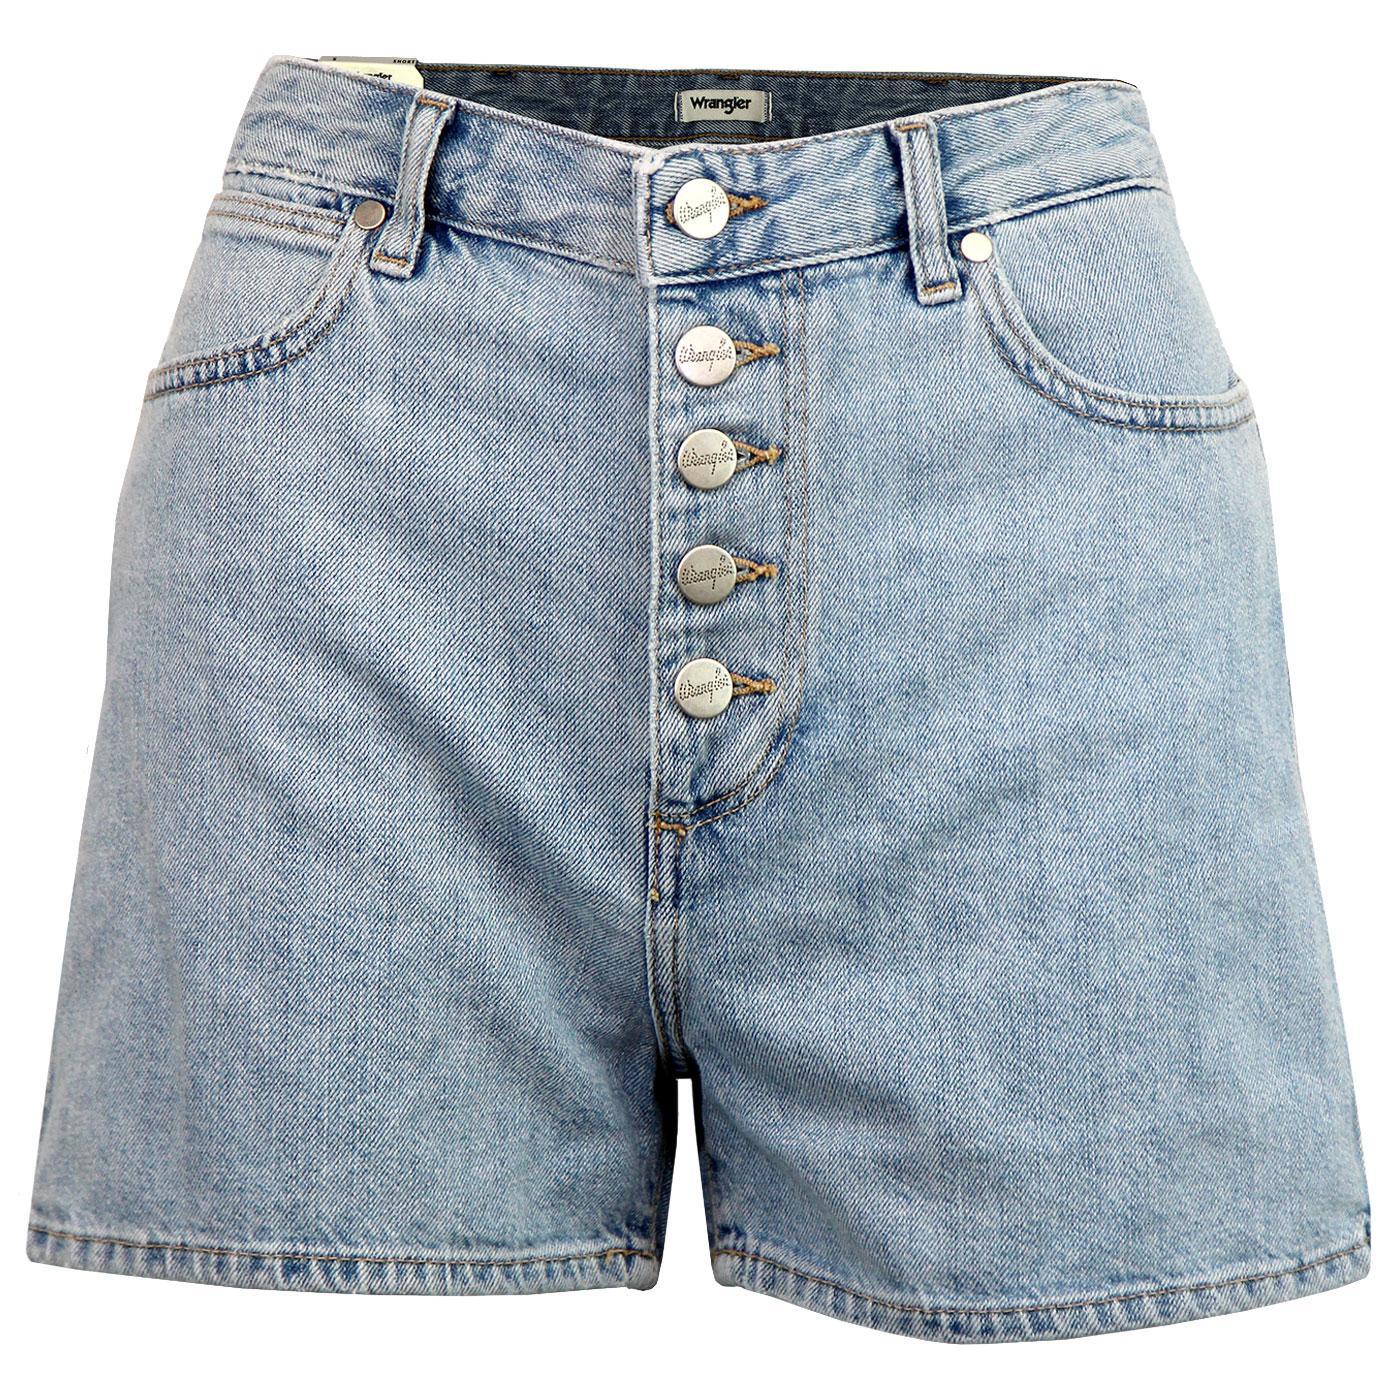 WRANGLER Women's Stonewash Denim Retro Shorts